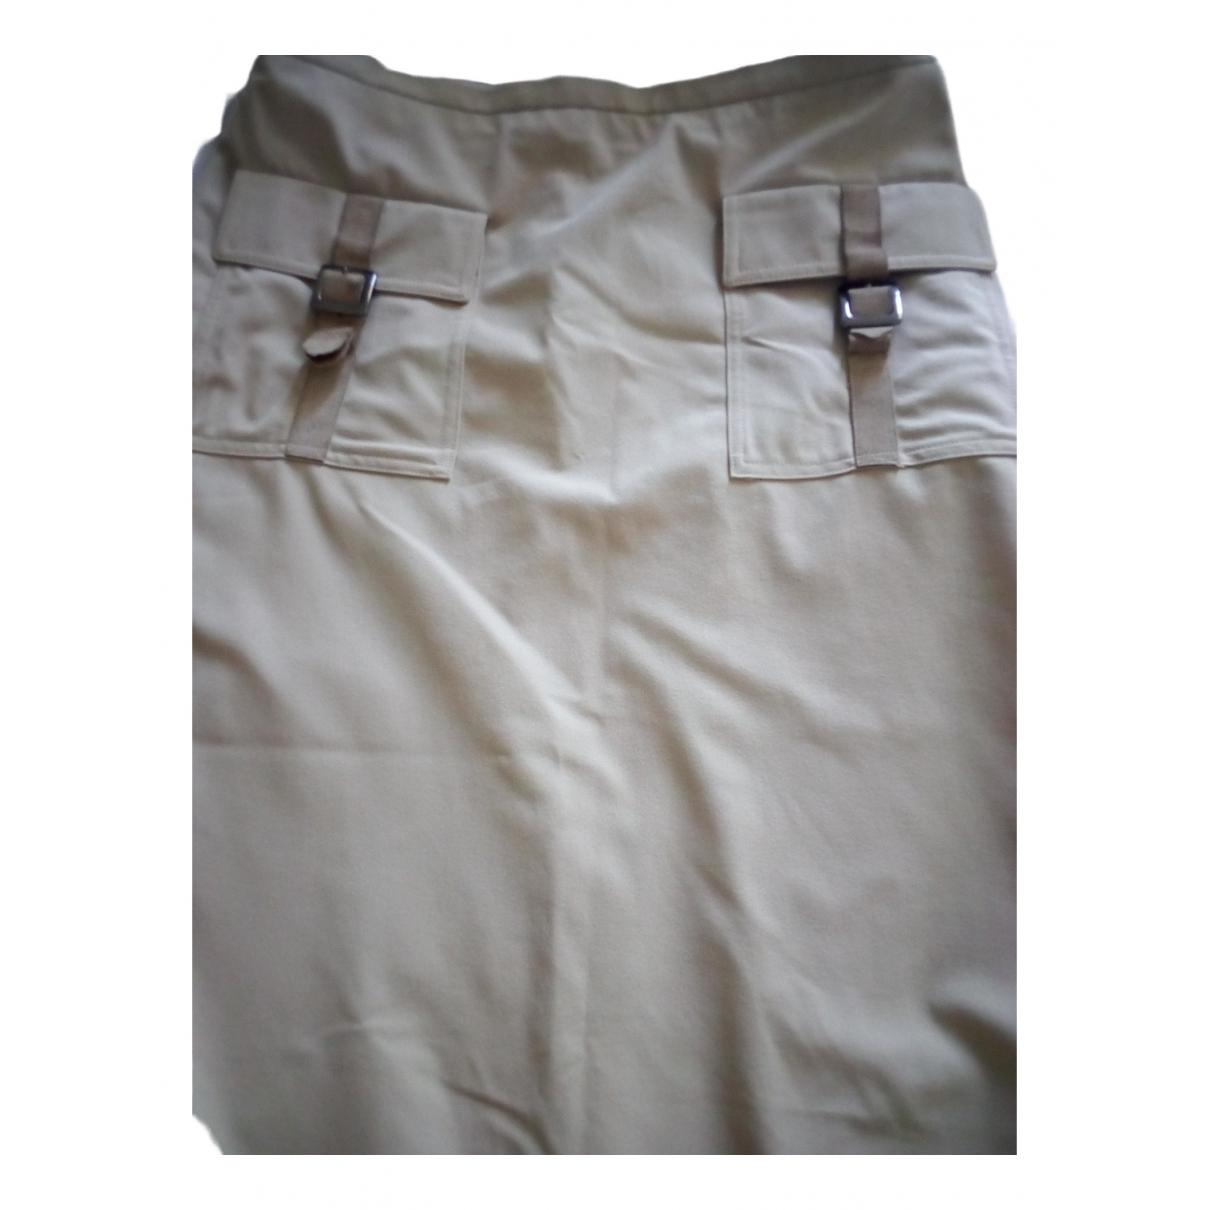 Gianfranco Ferré \N Beige Cotton - elasthane skirt for Women 42 IT